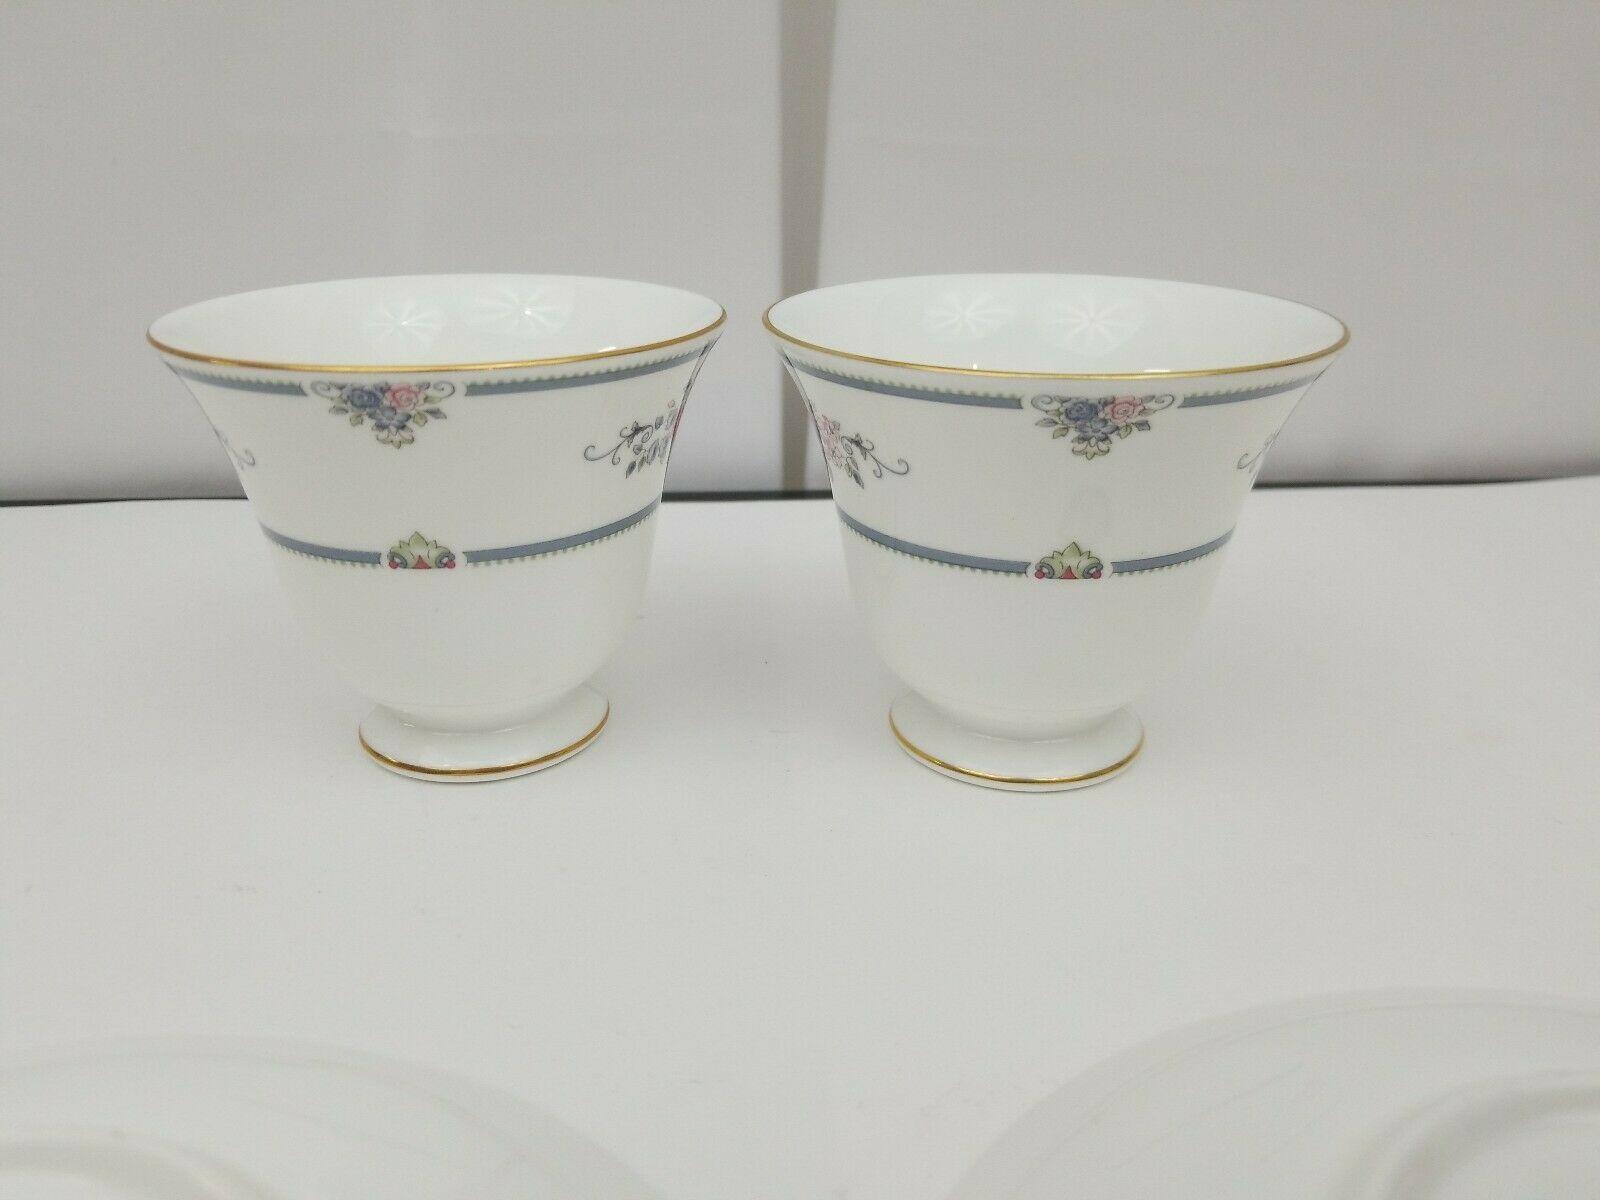 Wedgwood Bone China Cup & Saucer Set of 2 Charlotte White Gold Trim England 1991 image 9